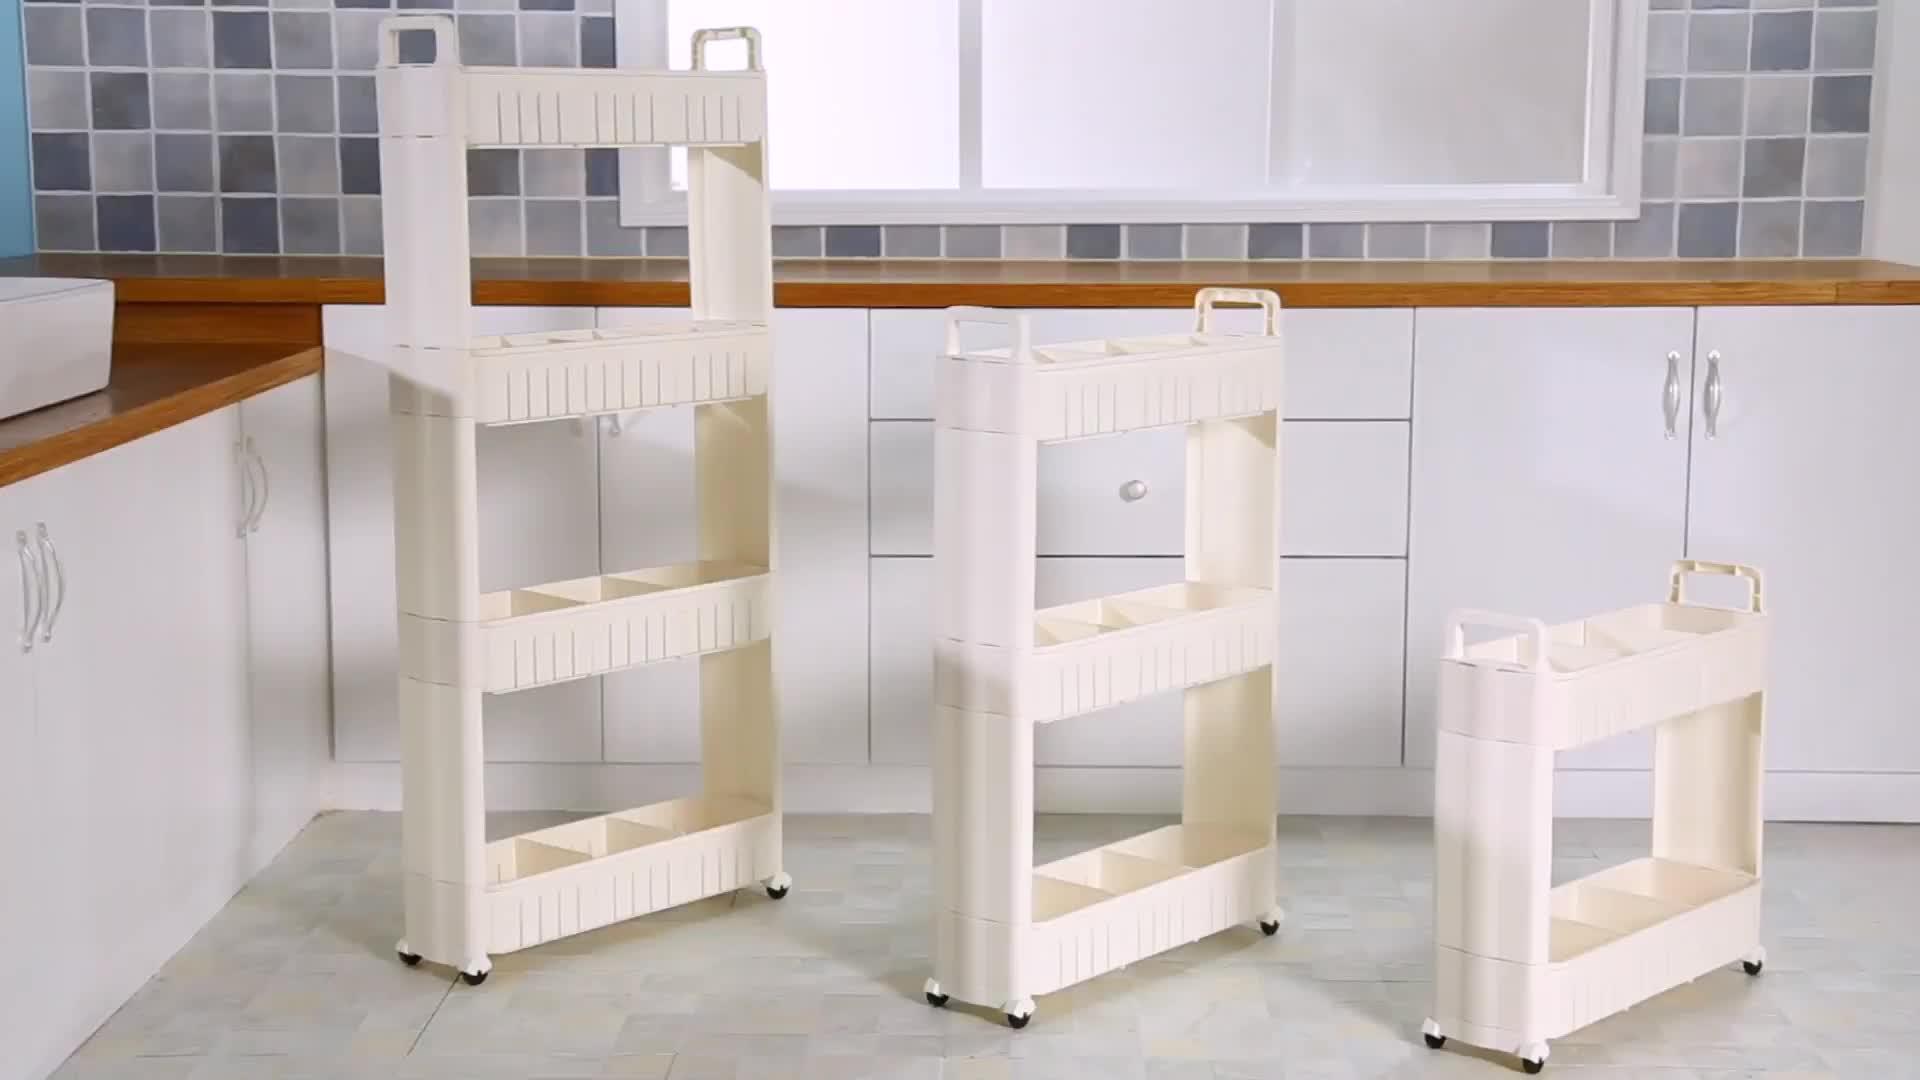 Homeware 4 layers folding bath kitchen laundry room - Organizador de lavanderia ...